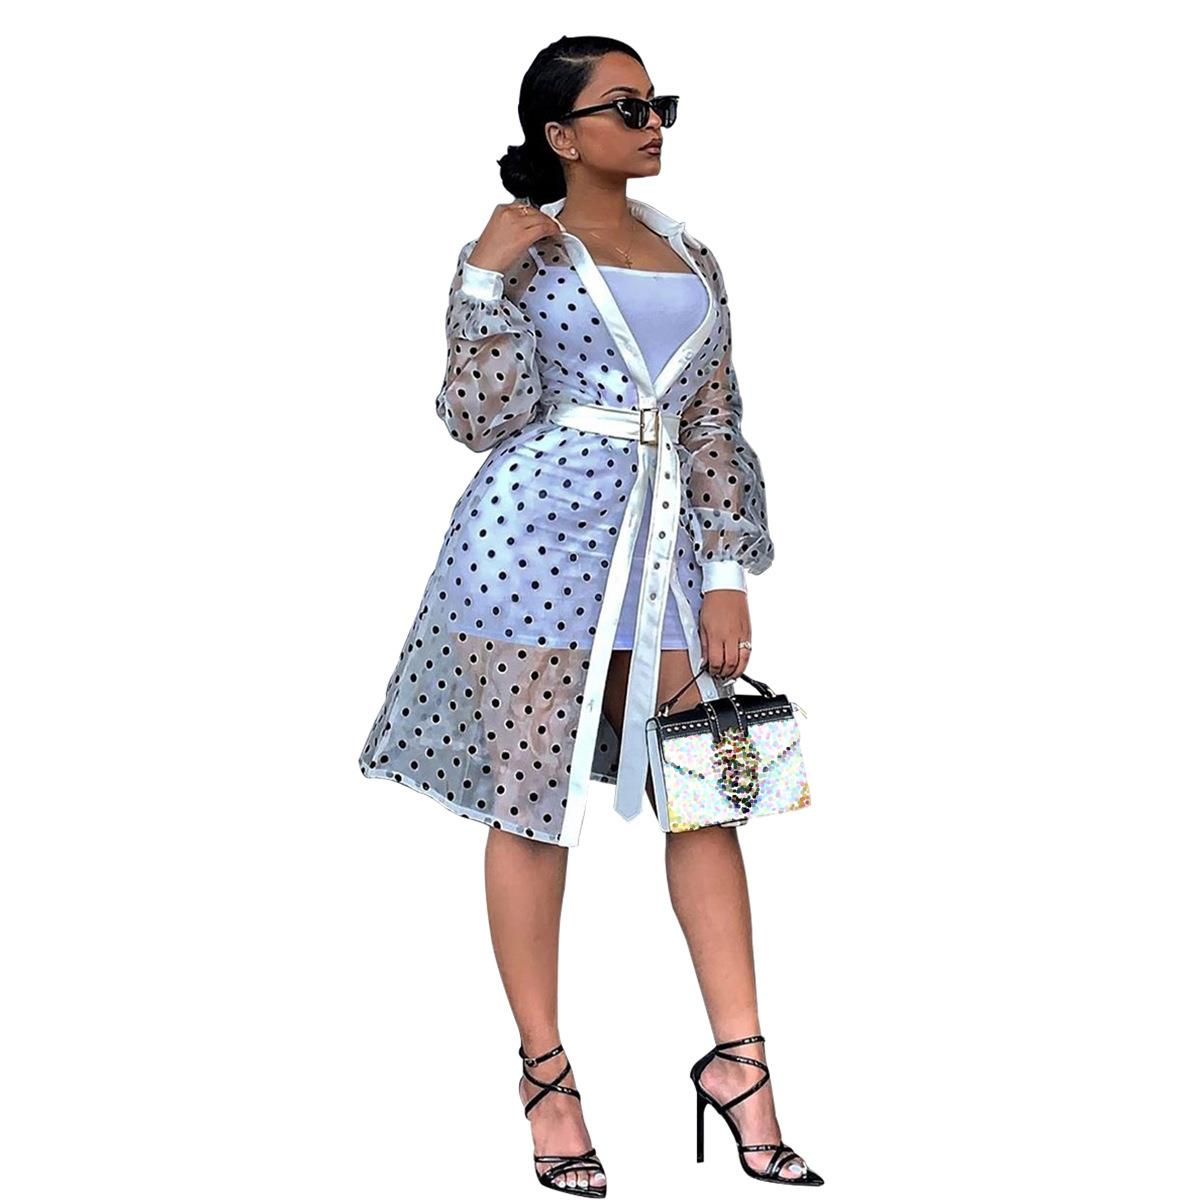 Pu Leather Patchwork Polka Dots Print Long Coat Shirt Dress Casual Belt Turn Down Collar Full Lantern Sleeve Trench Coat